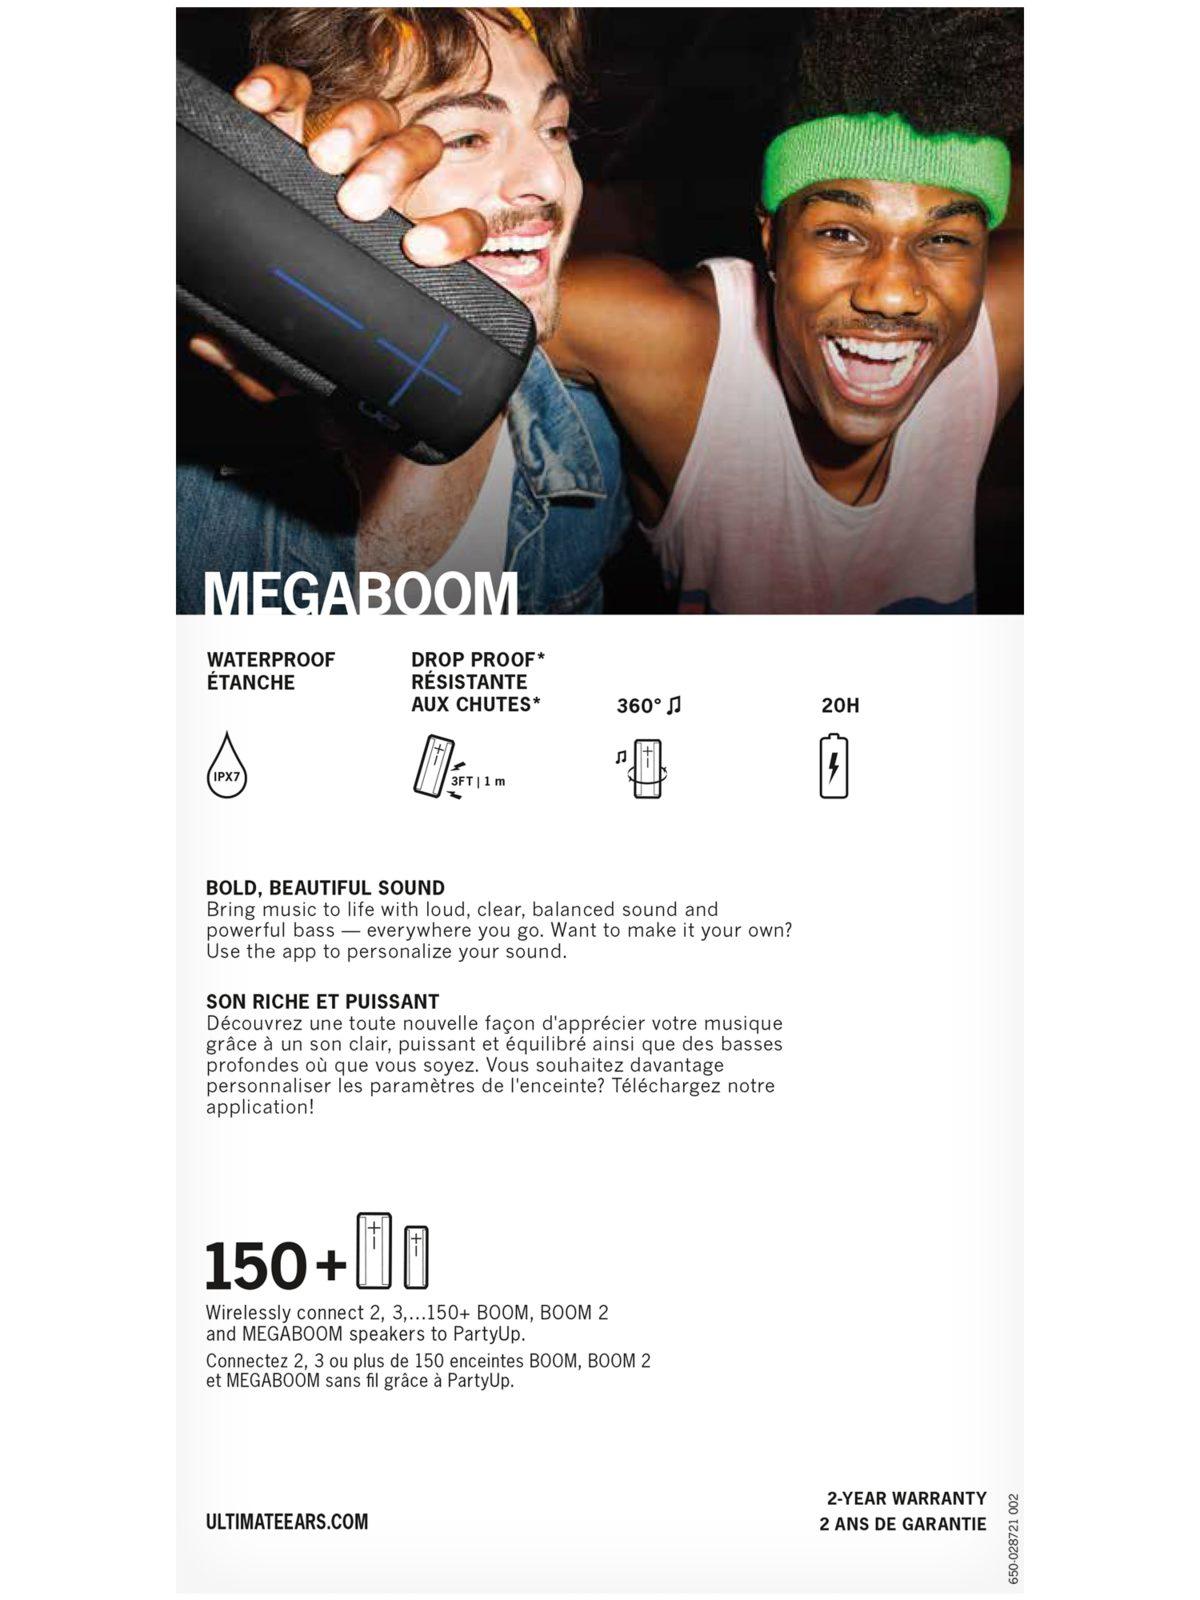 Ultimate Ears Megaboom Big Portable Bluetooth Speaker Plum In The Box